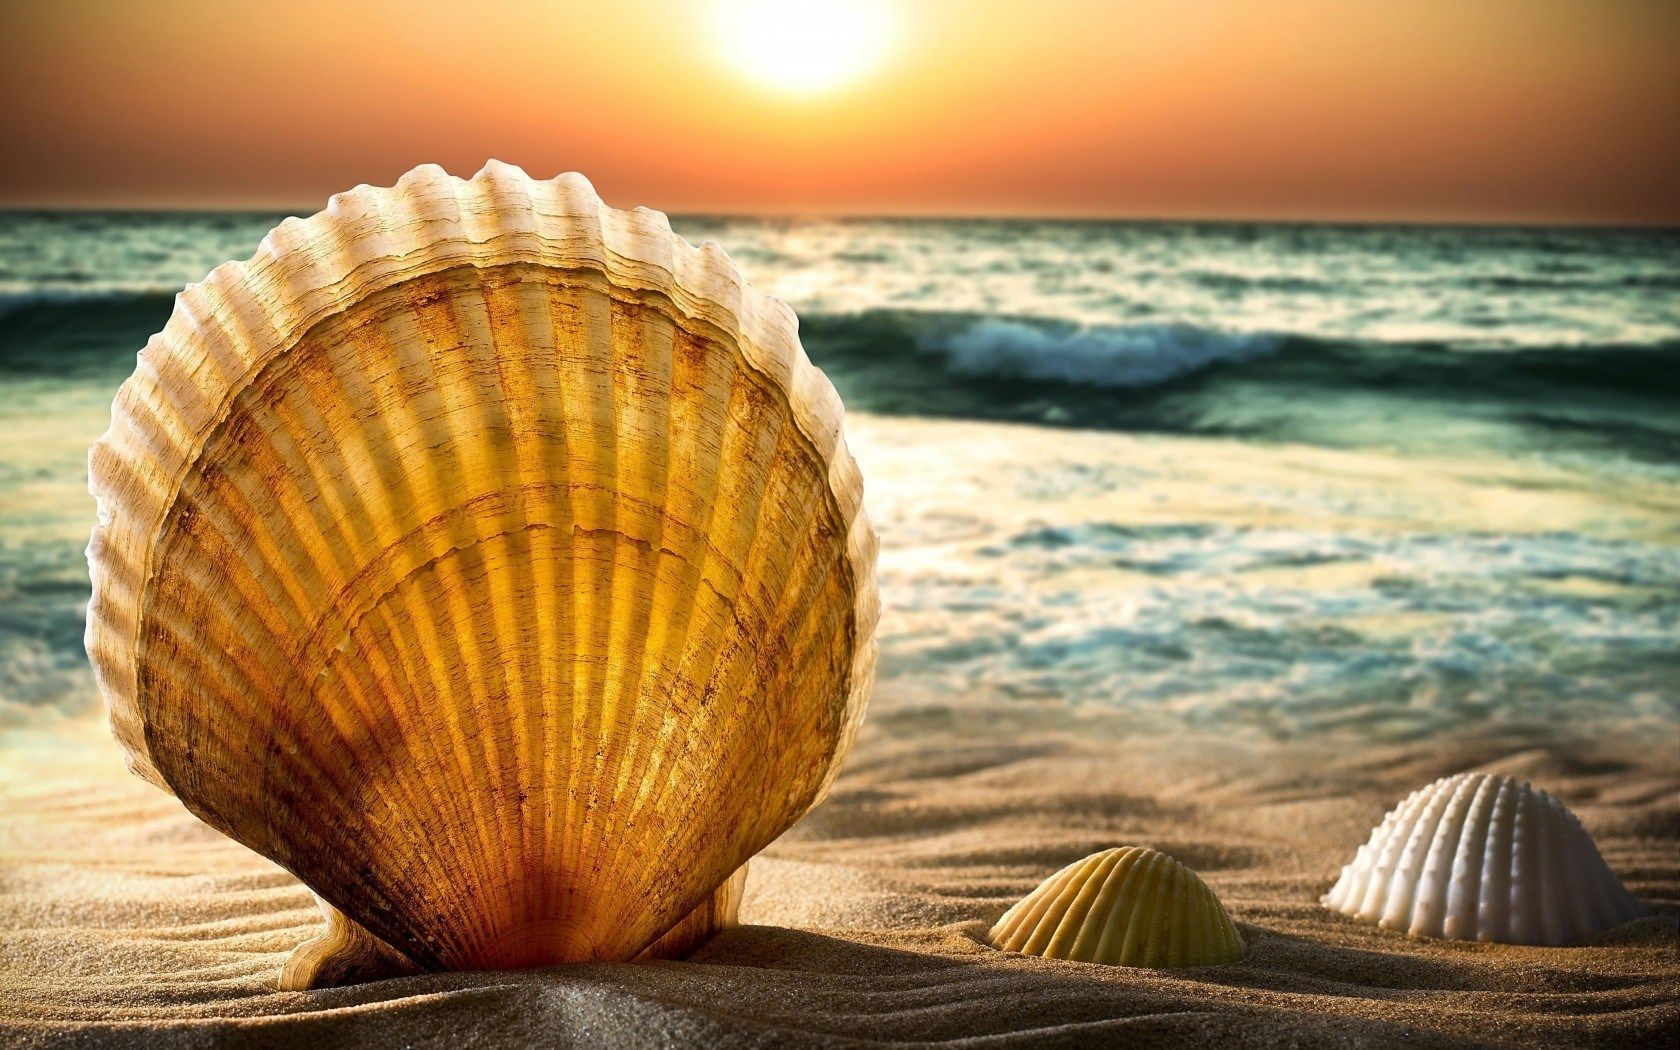 sunset beach nature sea - photo #34